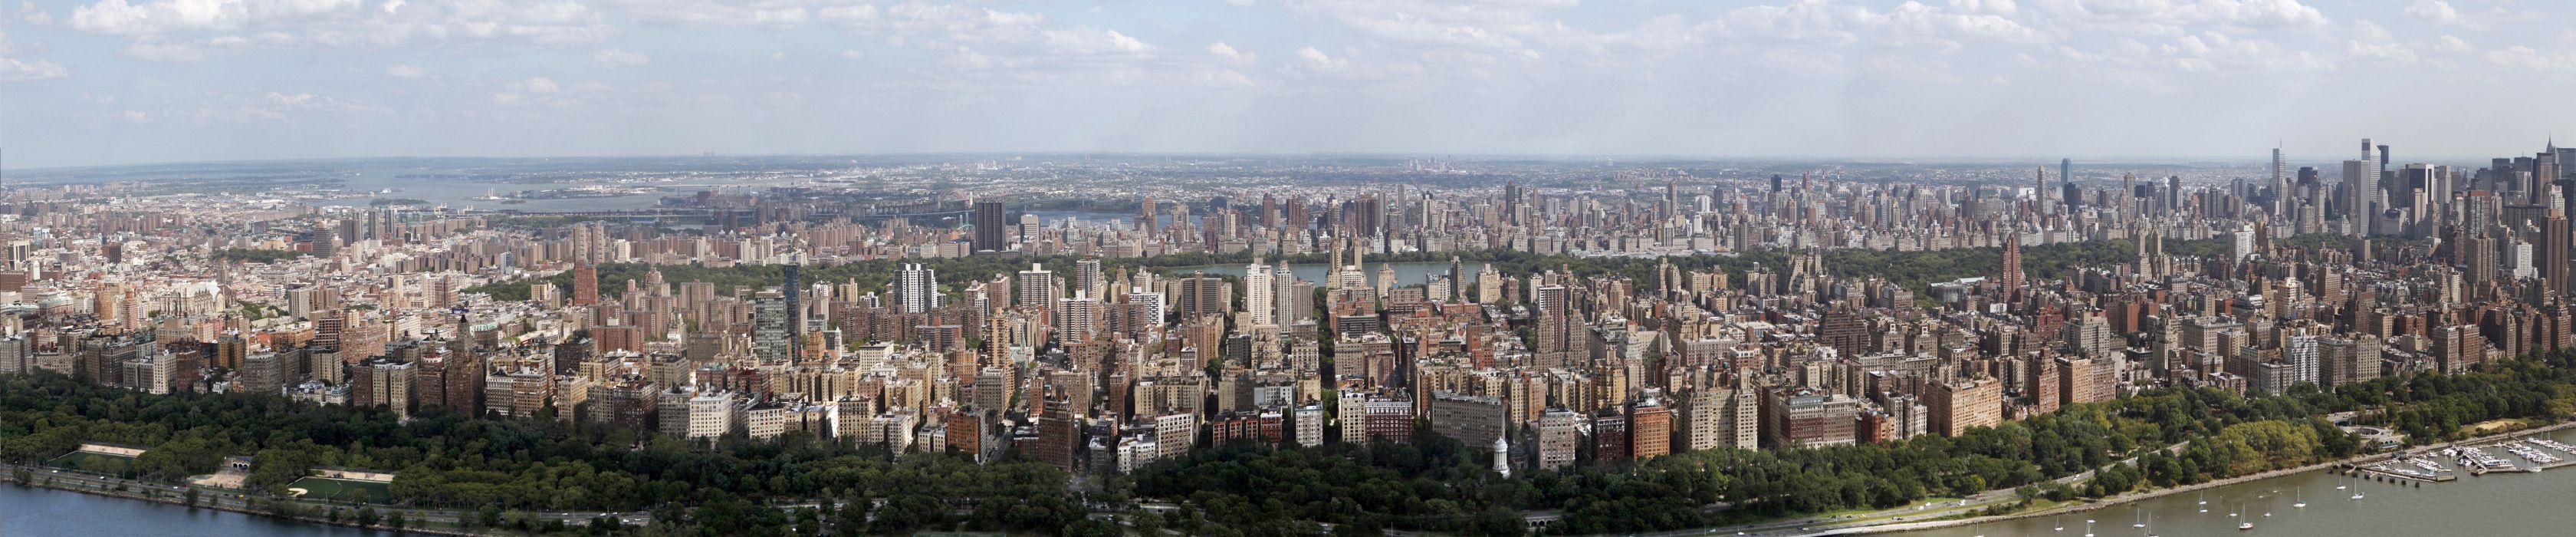 New York City Central Park     g wallpaper